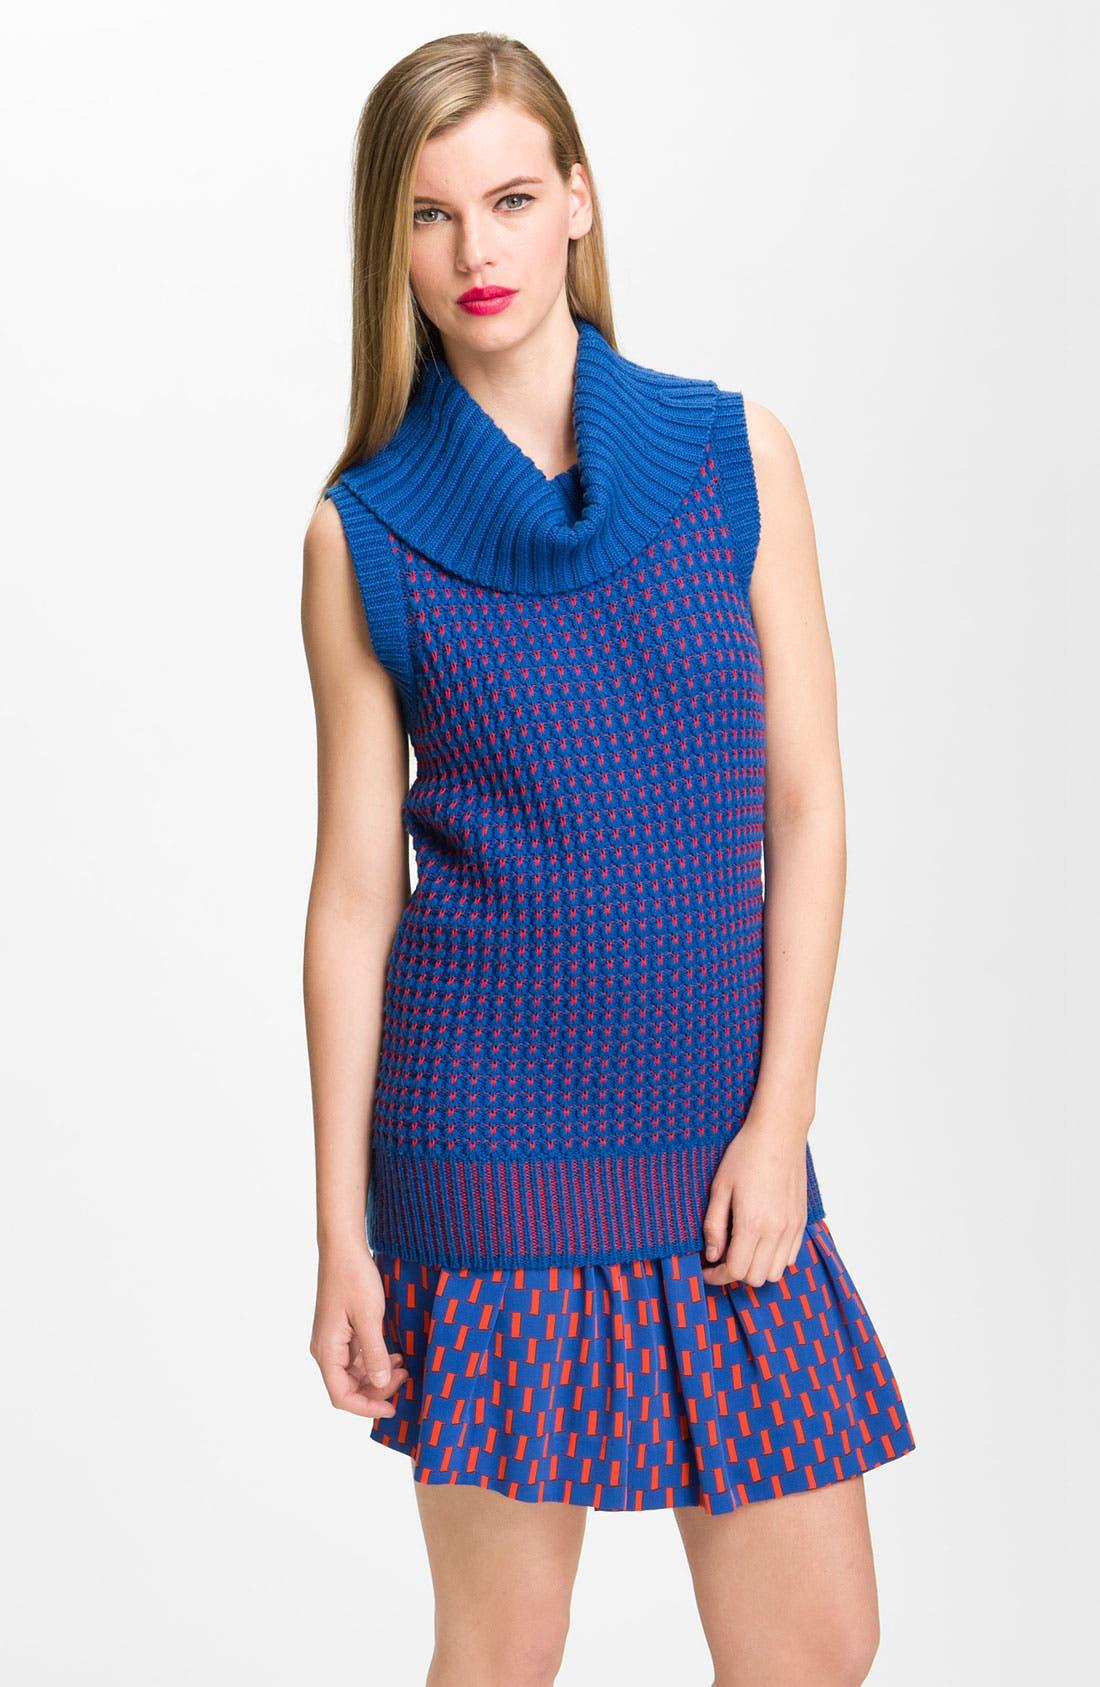 Alternate Image 1 Selected - Diane von Furstenberg 'Bede' Cowl Neck Sweater